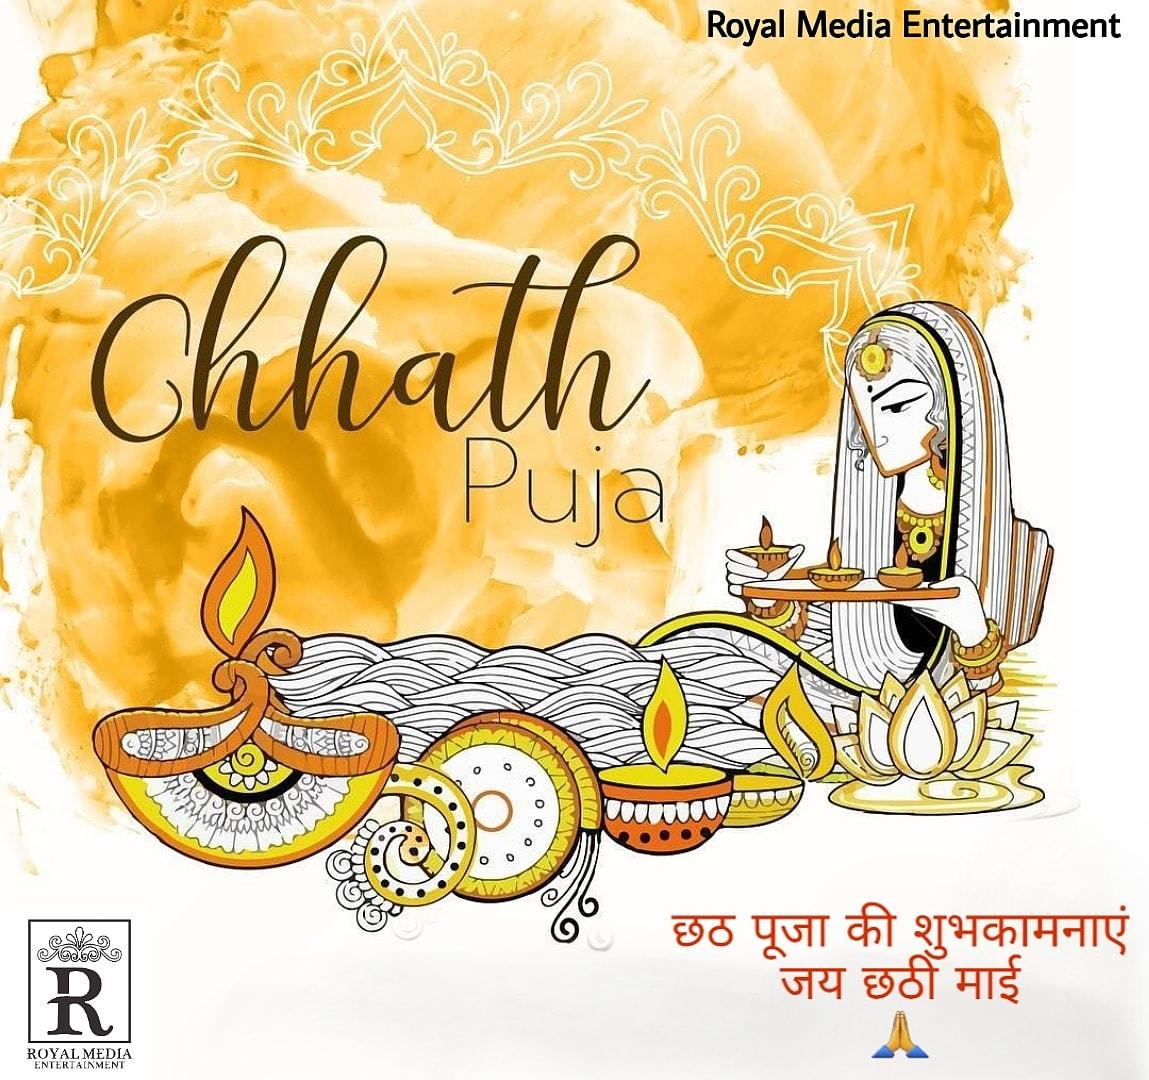 Chhathpuja